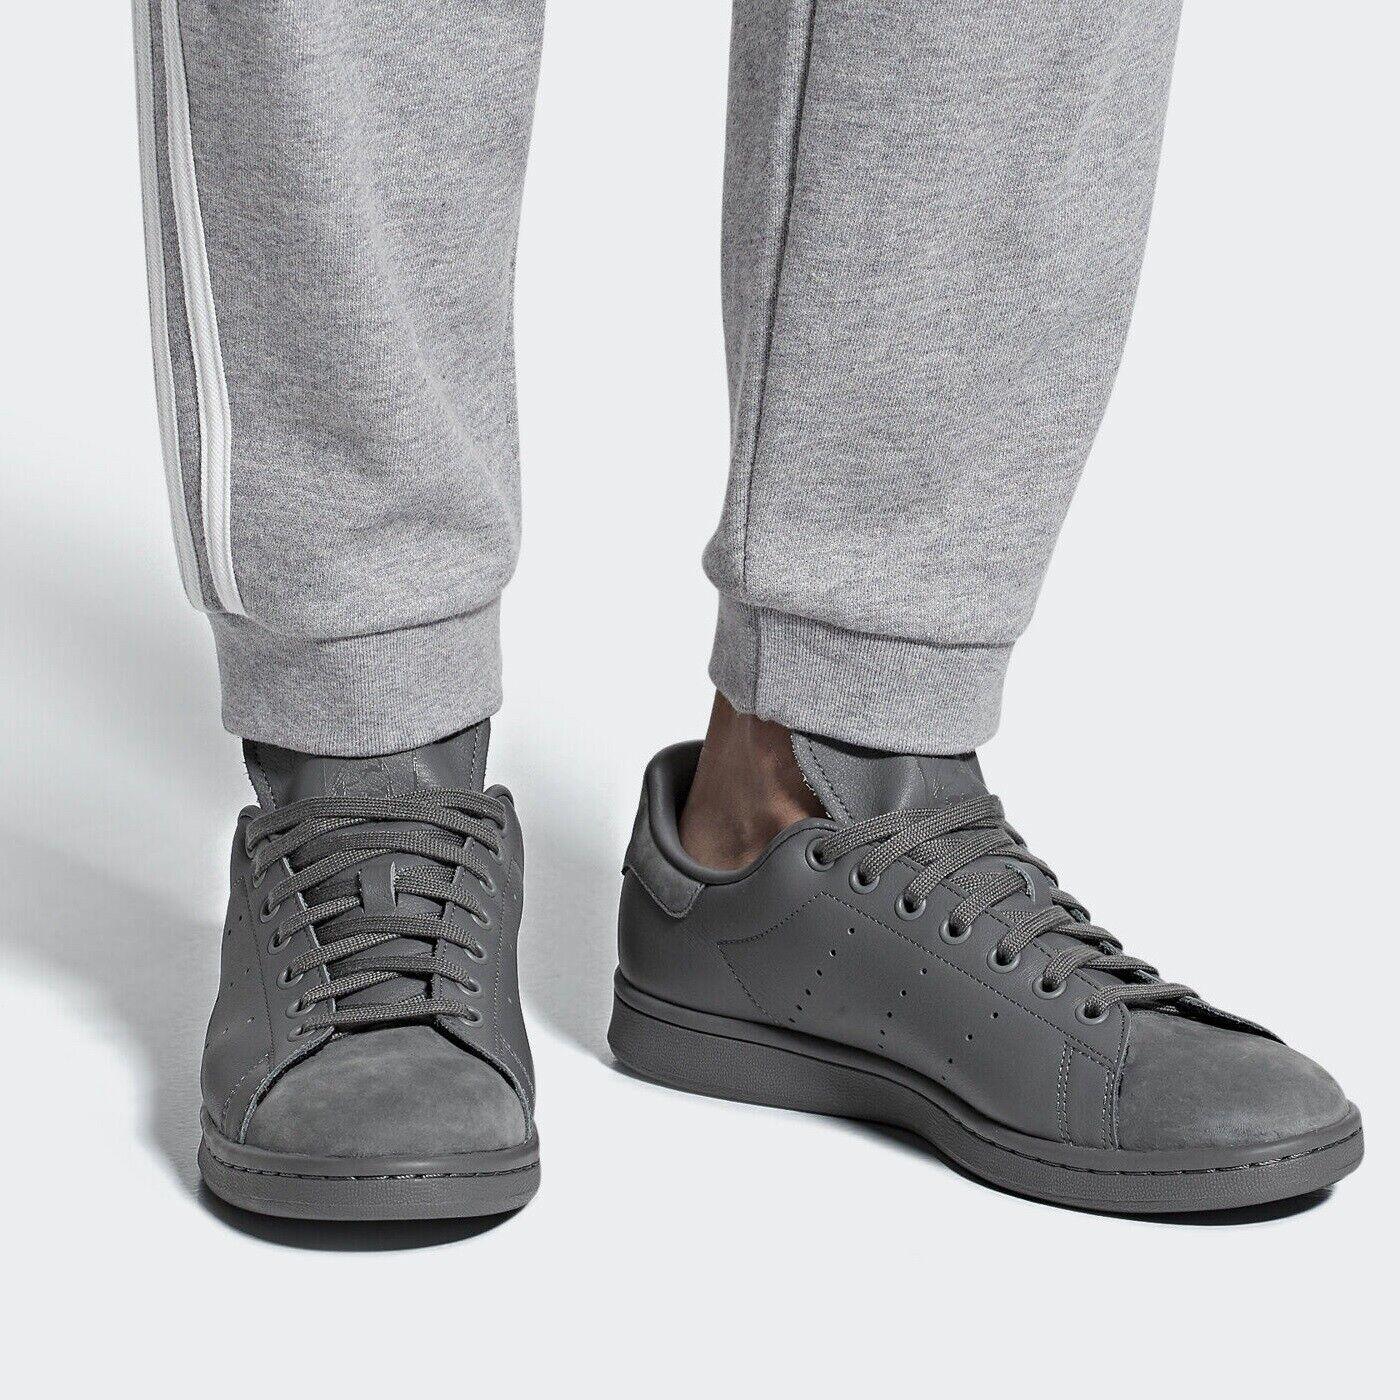 Adidas Originals Stan Smith Mens grau Leather Nubuck Trainers B37921 Größe 5-11